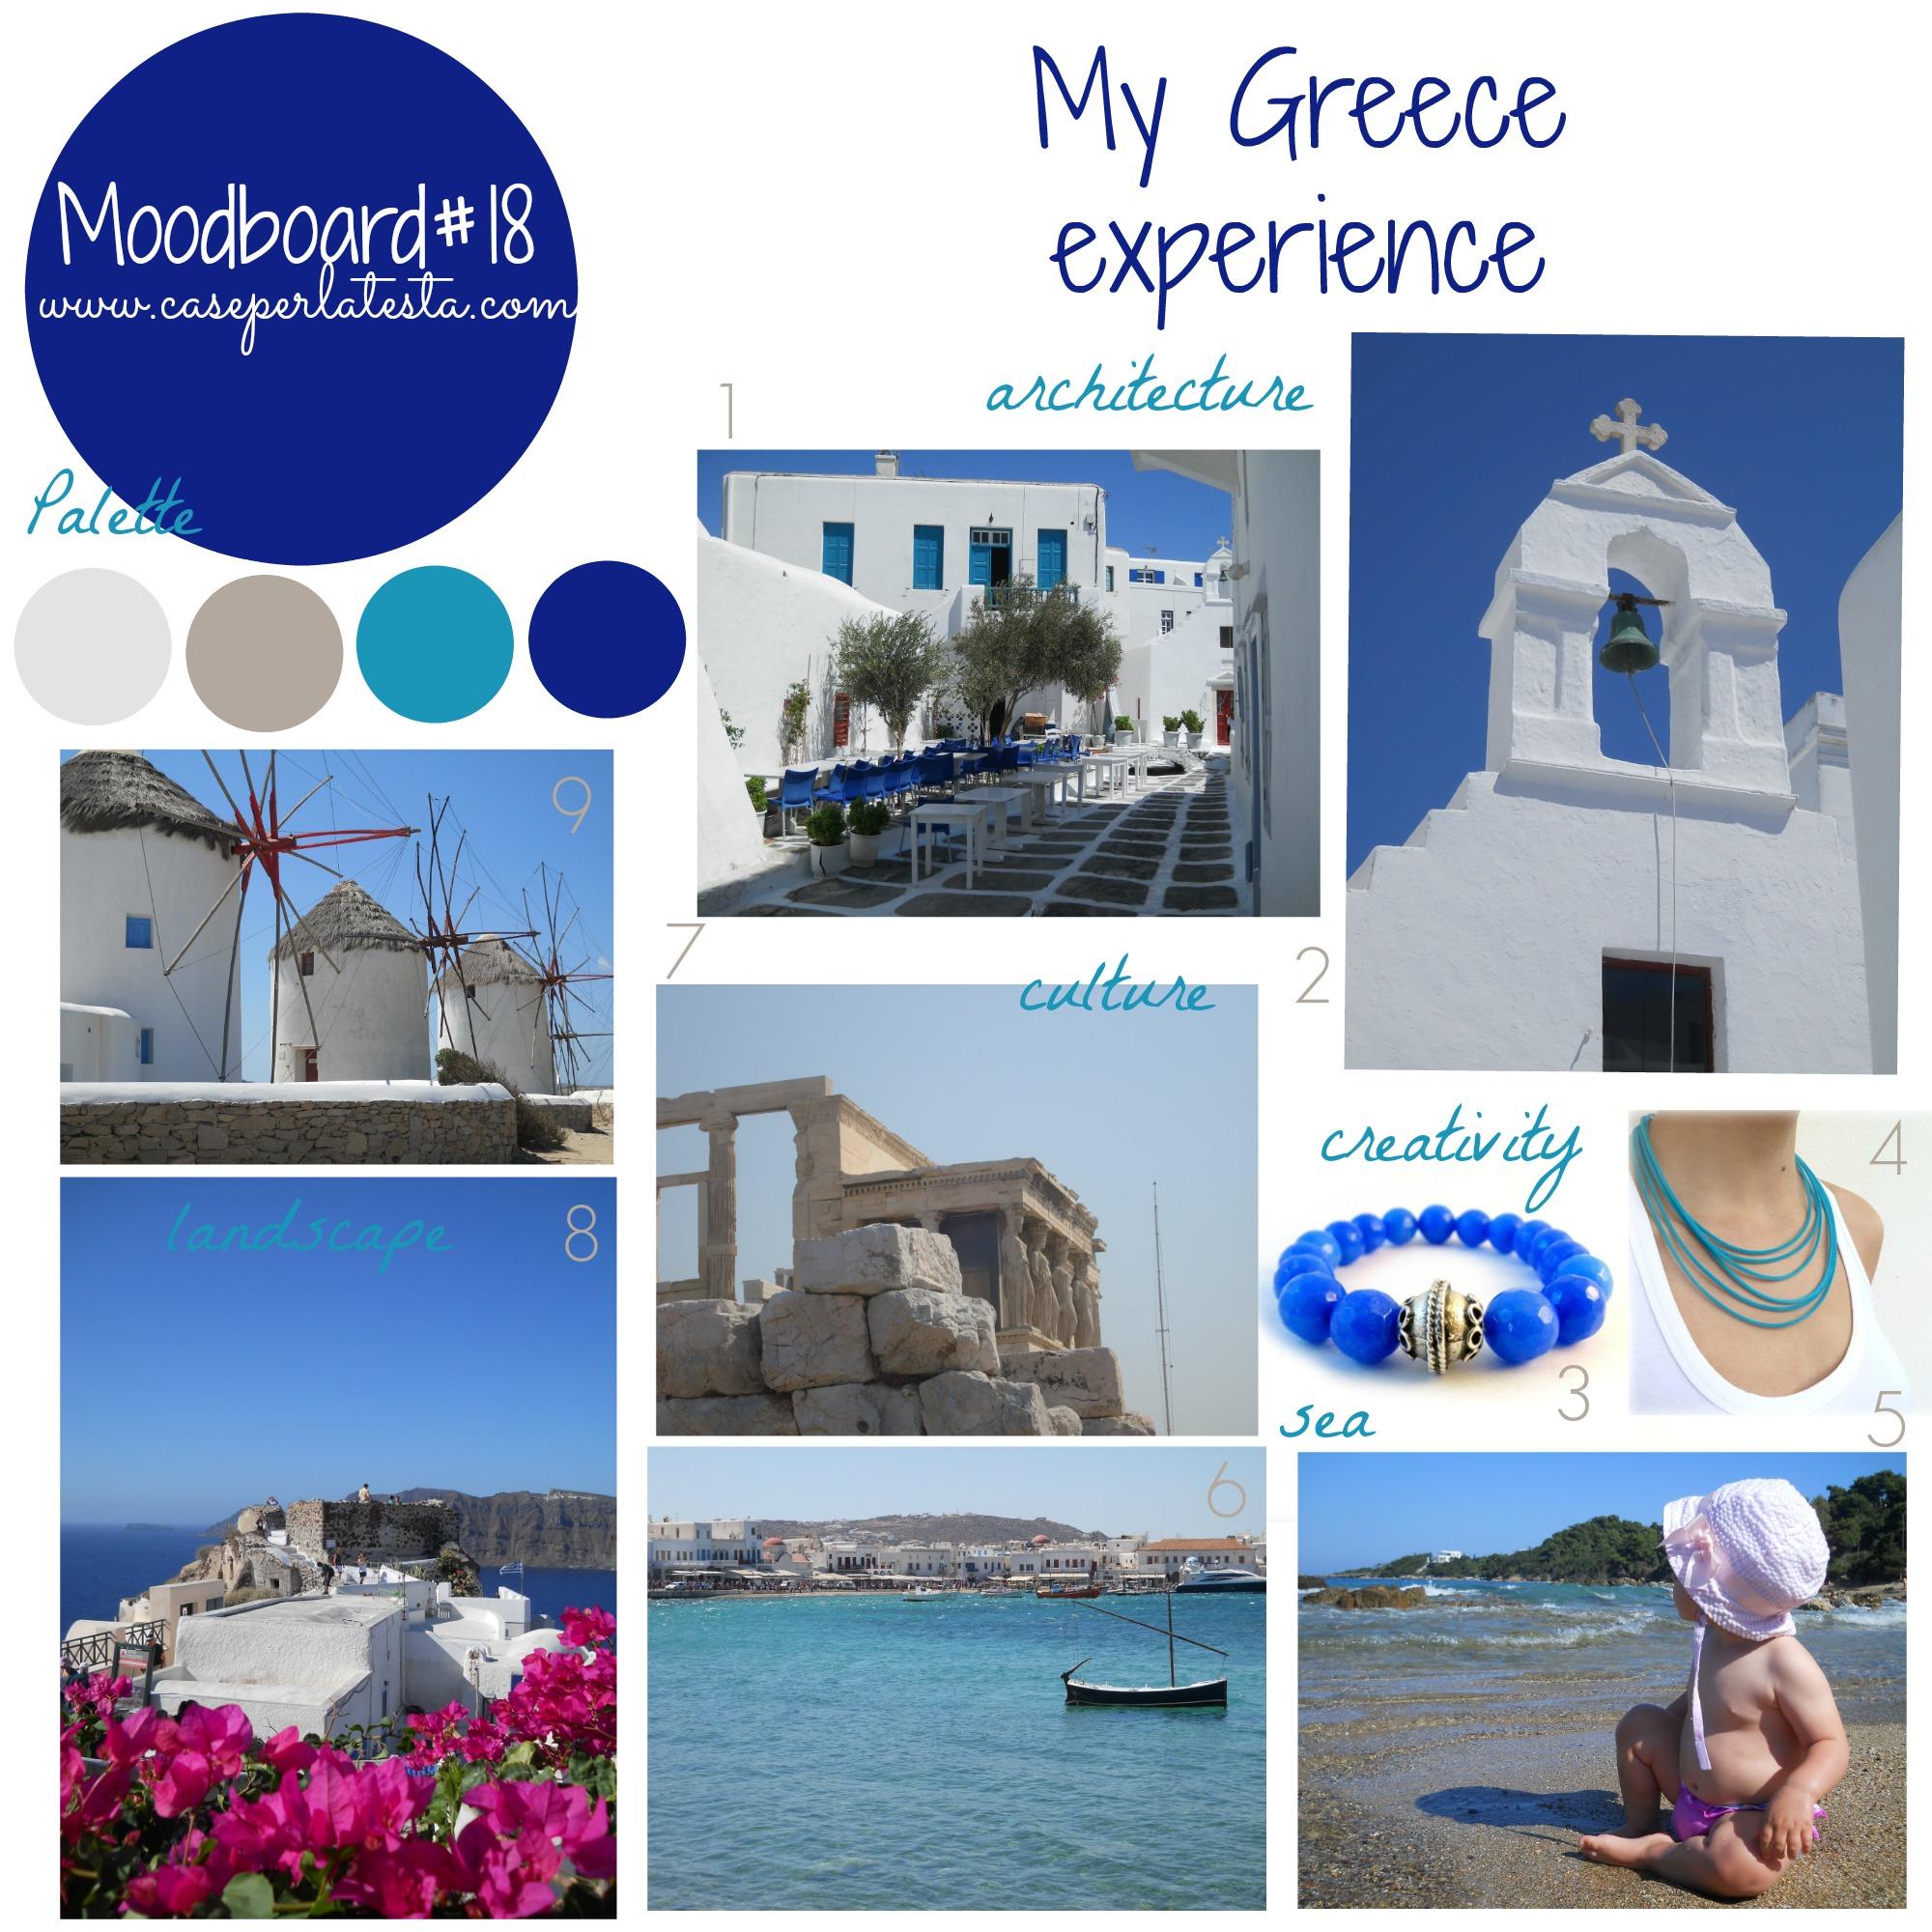 Moodbard#18_My_Greece_Experience